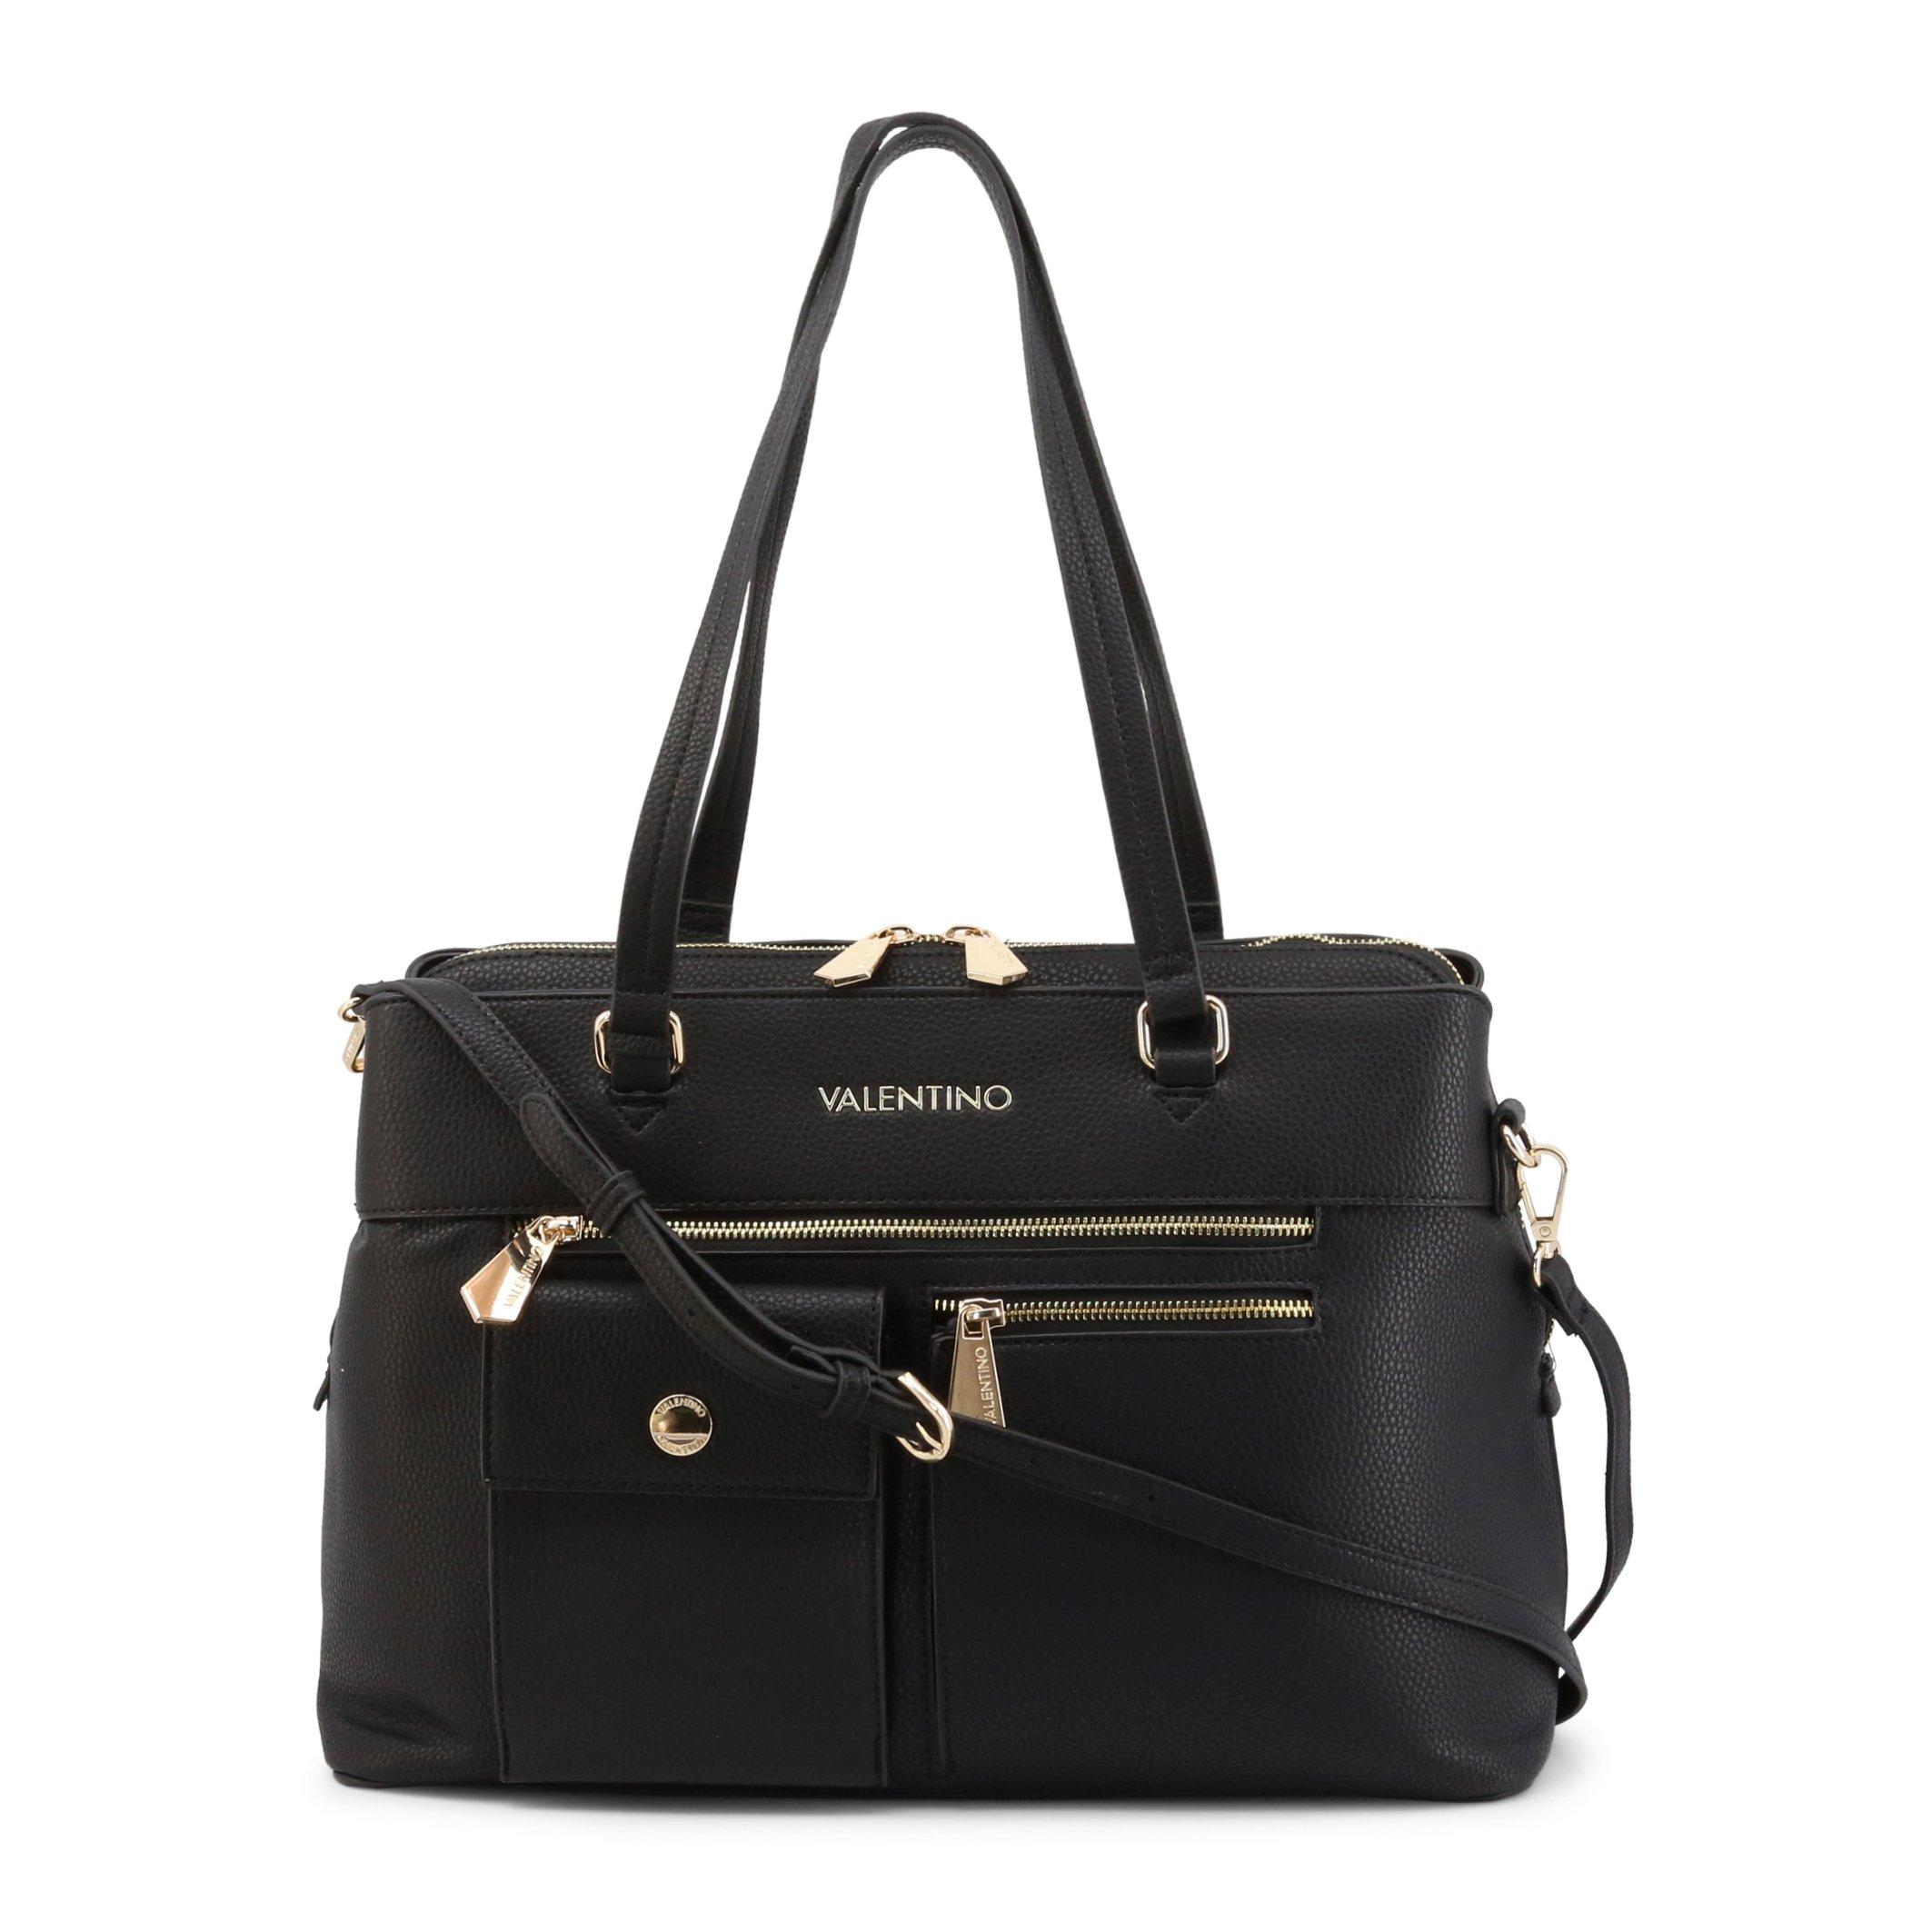 Valentino by Mario Valentino Women's Shoulder Bag Various Colours CASPER-VBS3XL05 - black NOSIZE